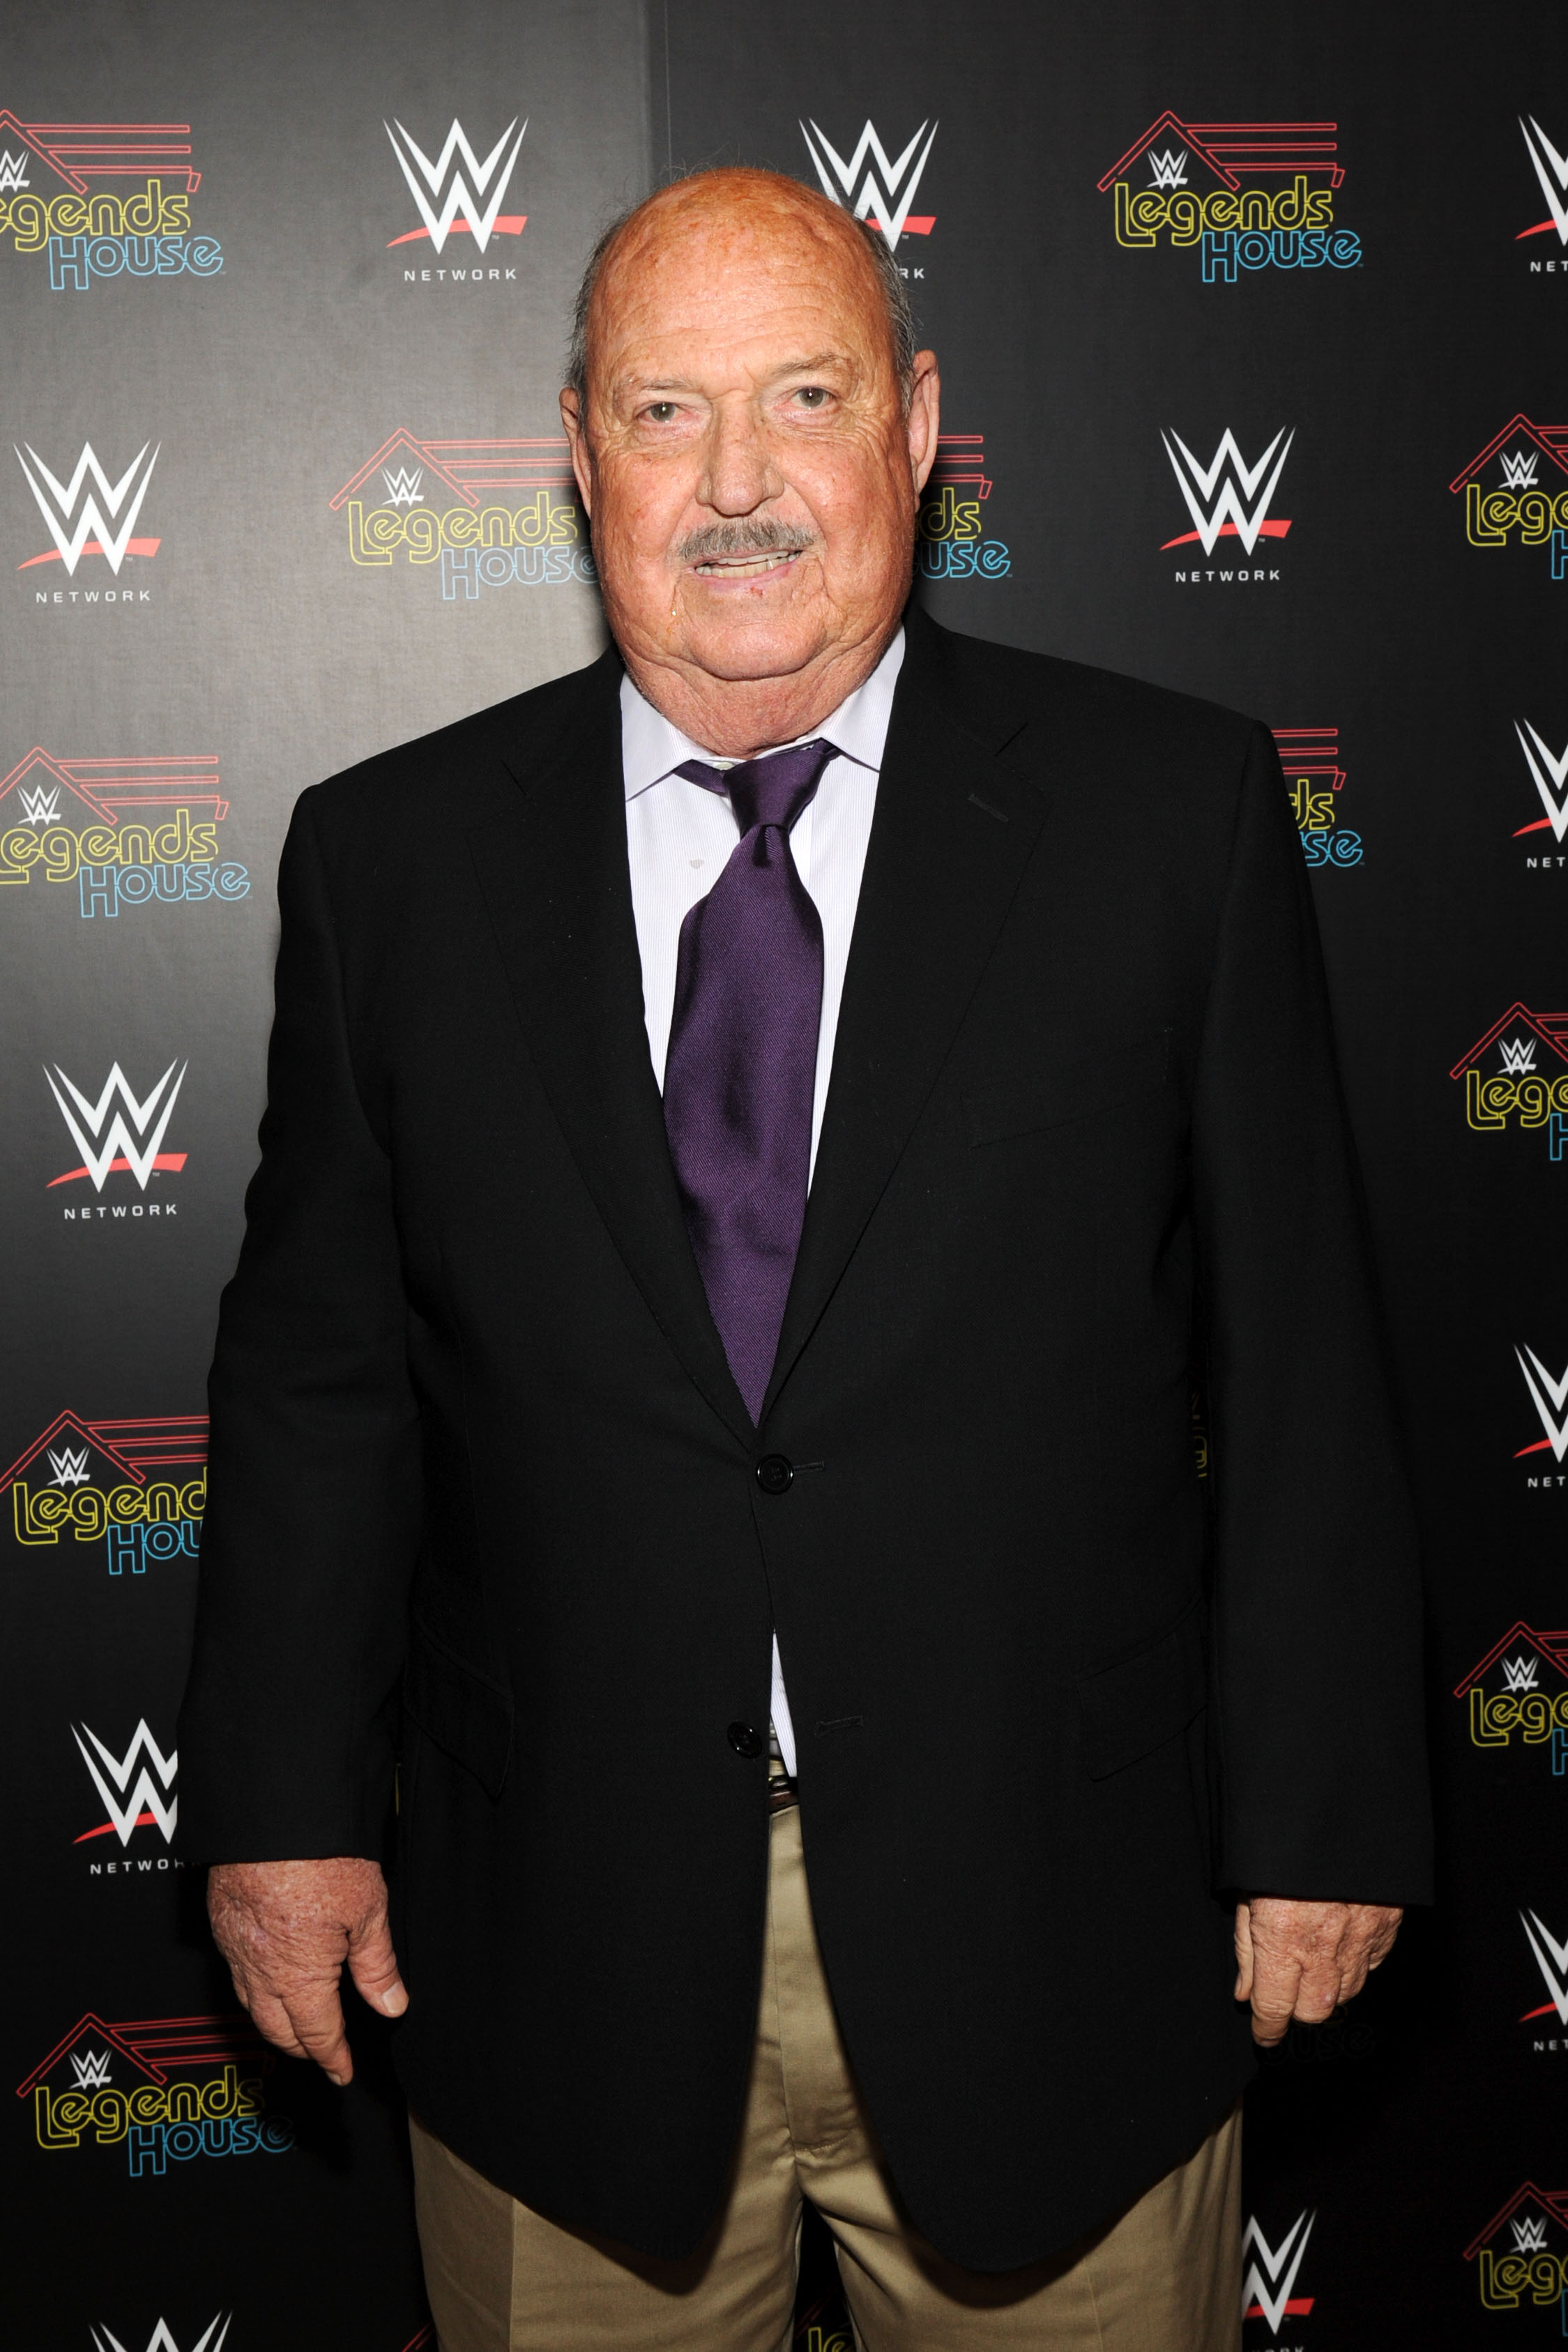 WWE Screening of 'Legends' House'